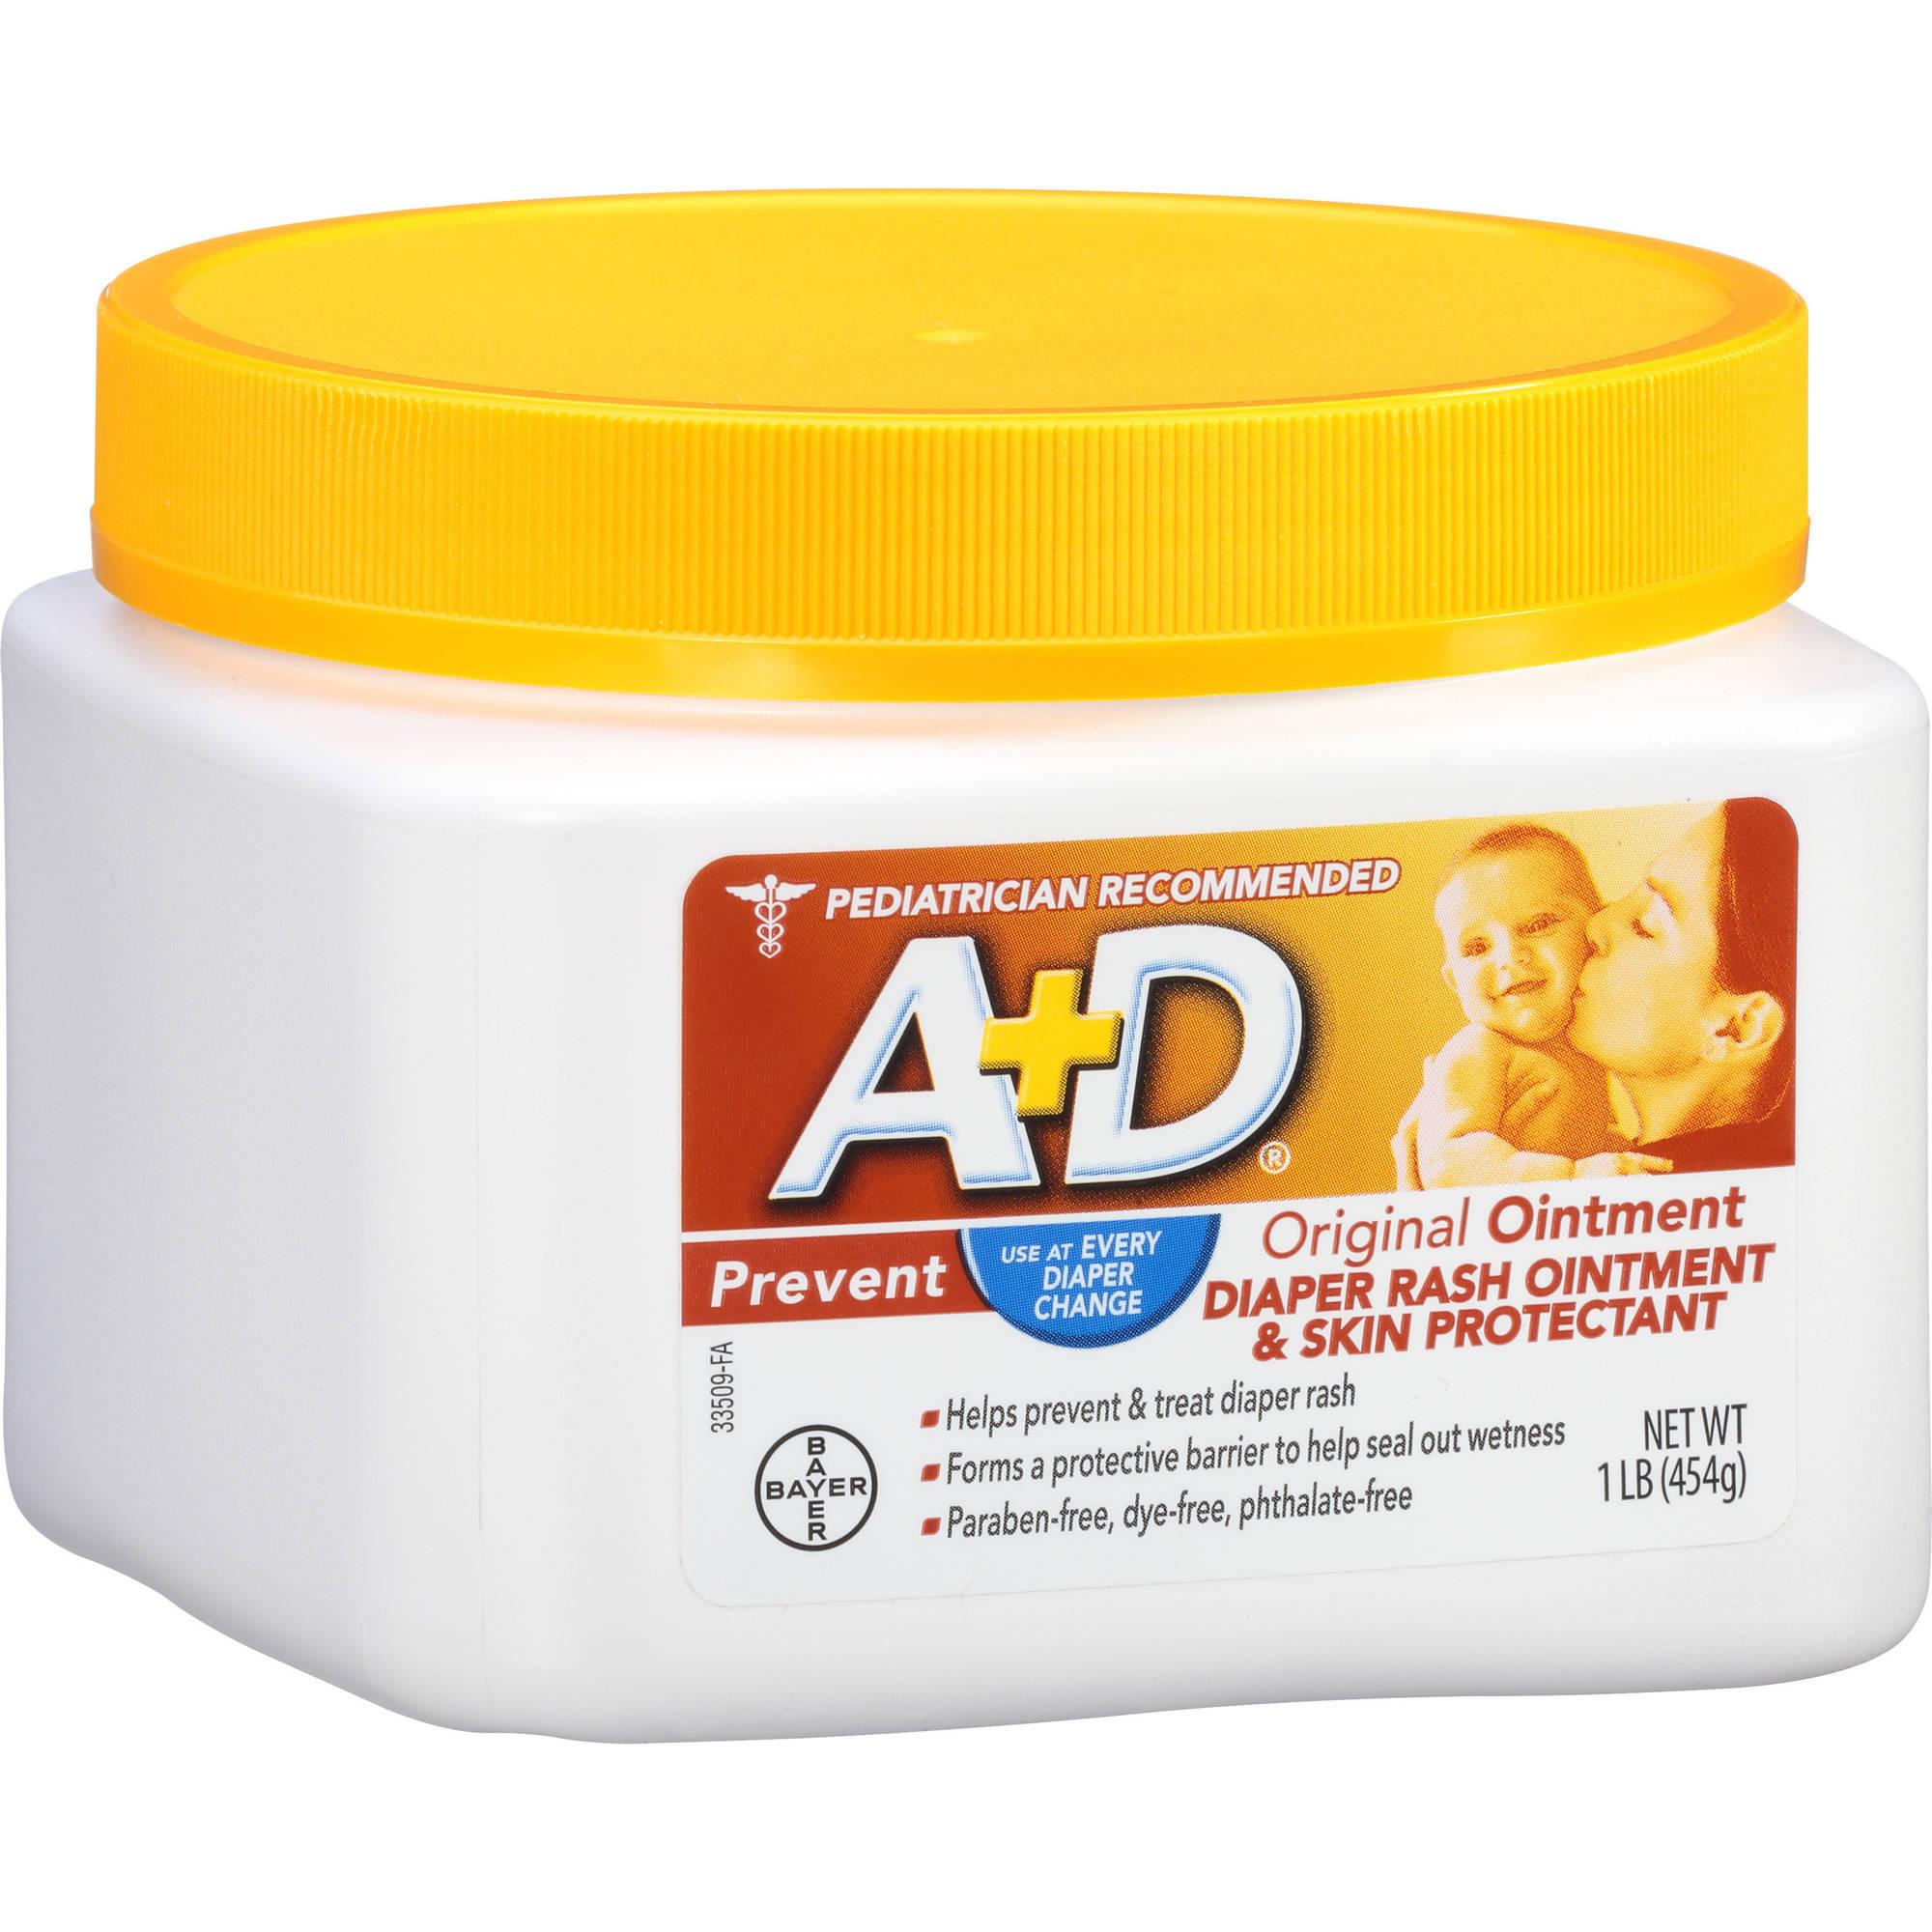 Image of A+D Original Ointment Jar, 1 Pound